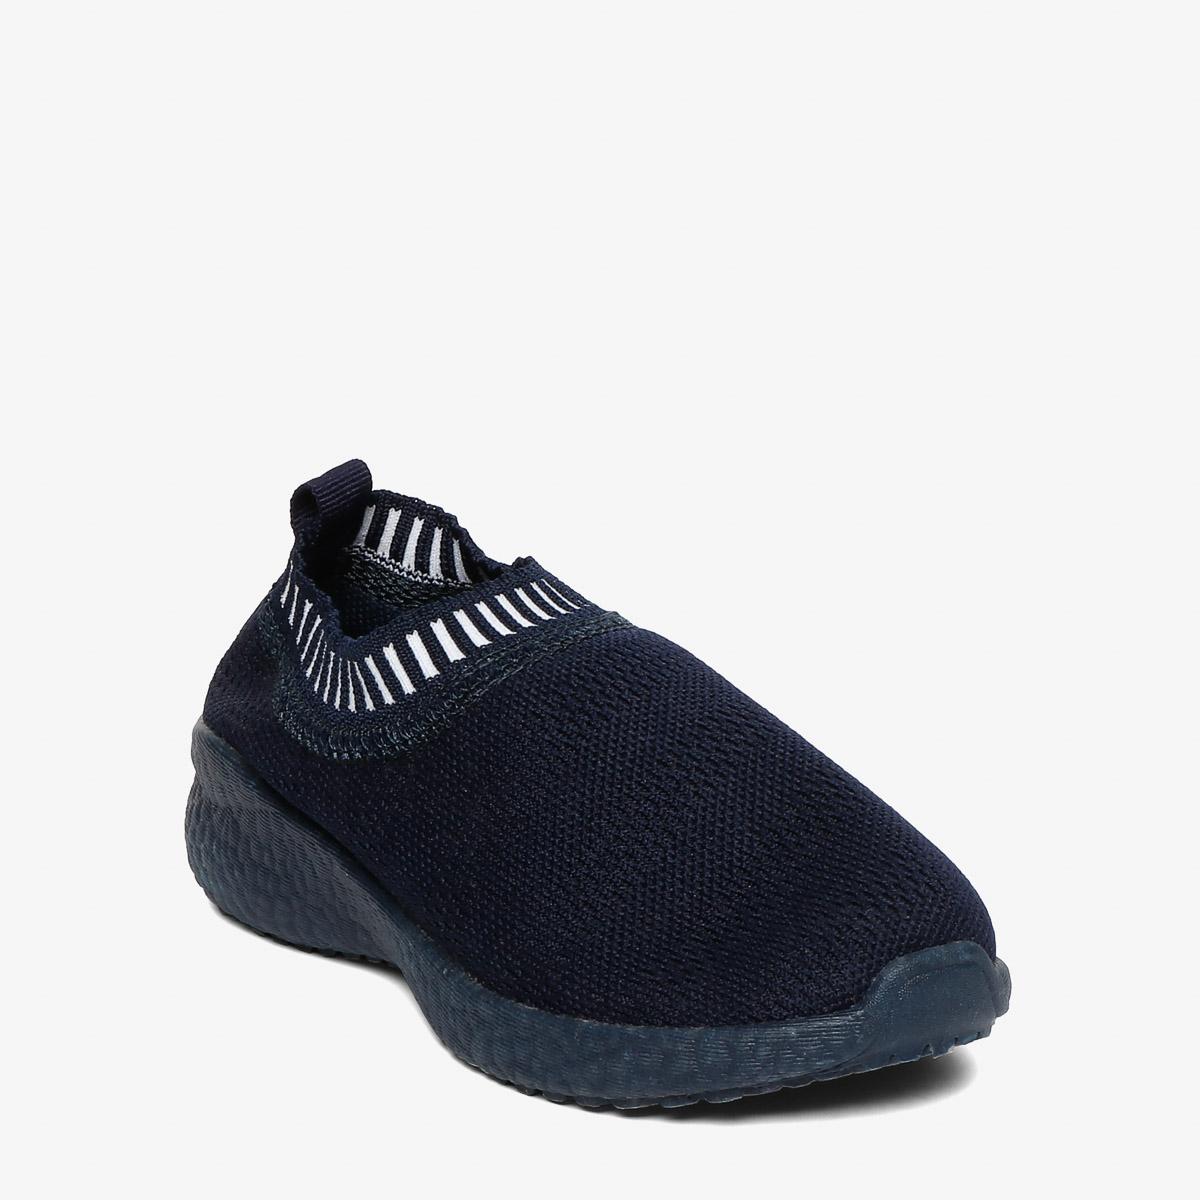 Tough Kids Boys' Ruso 2 Rubber Shoes in